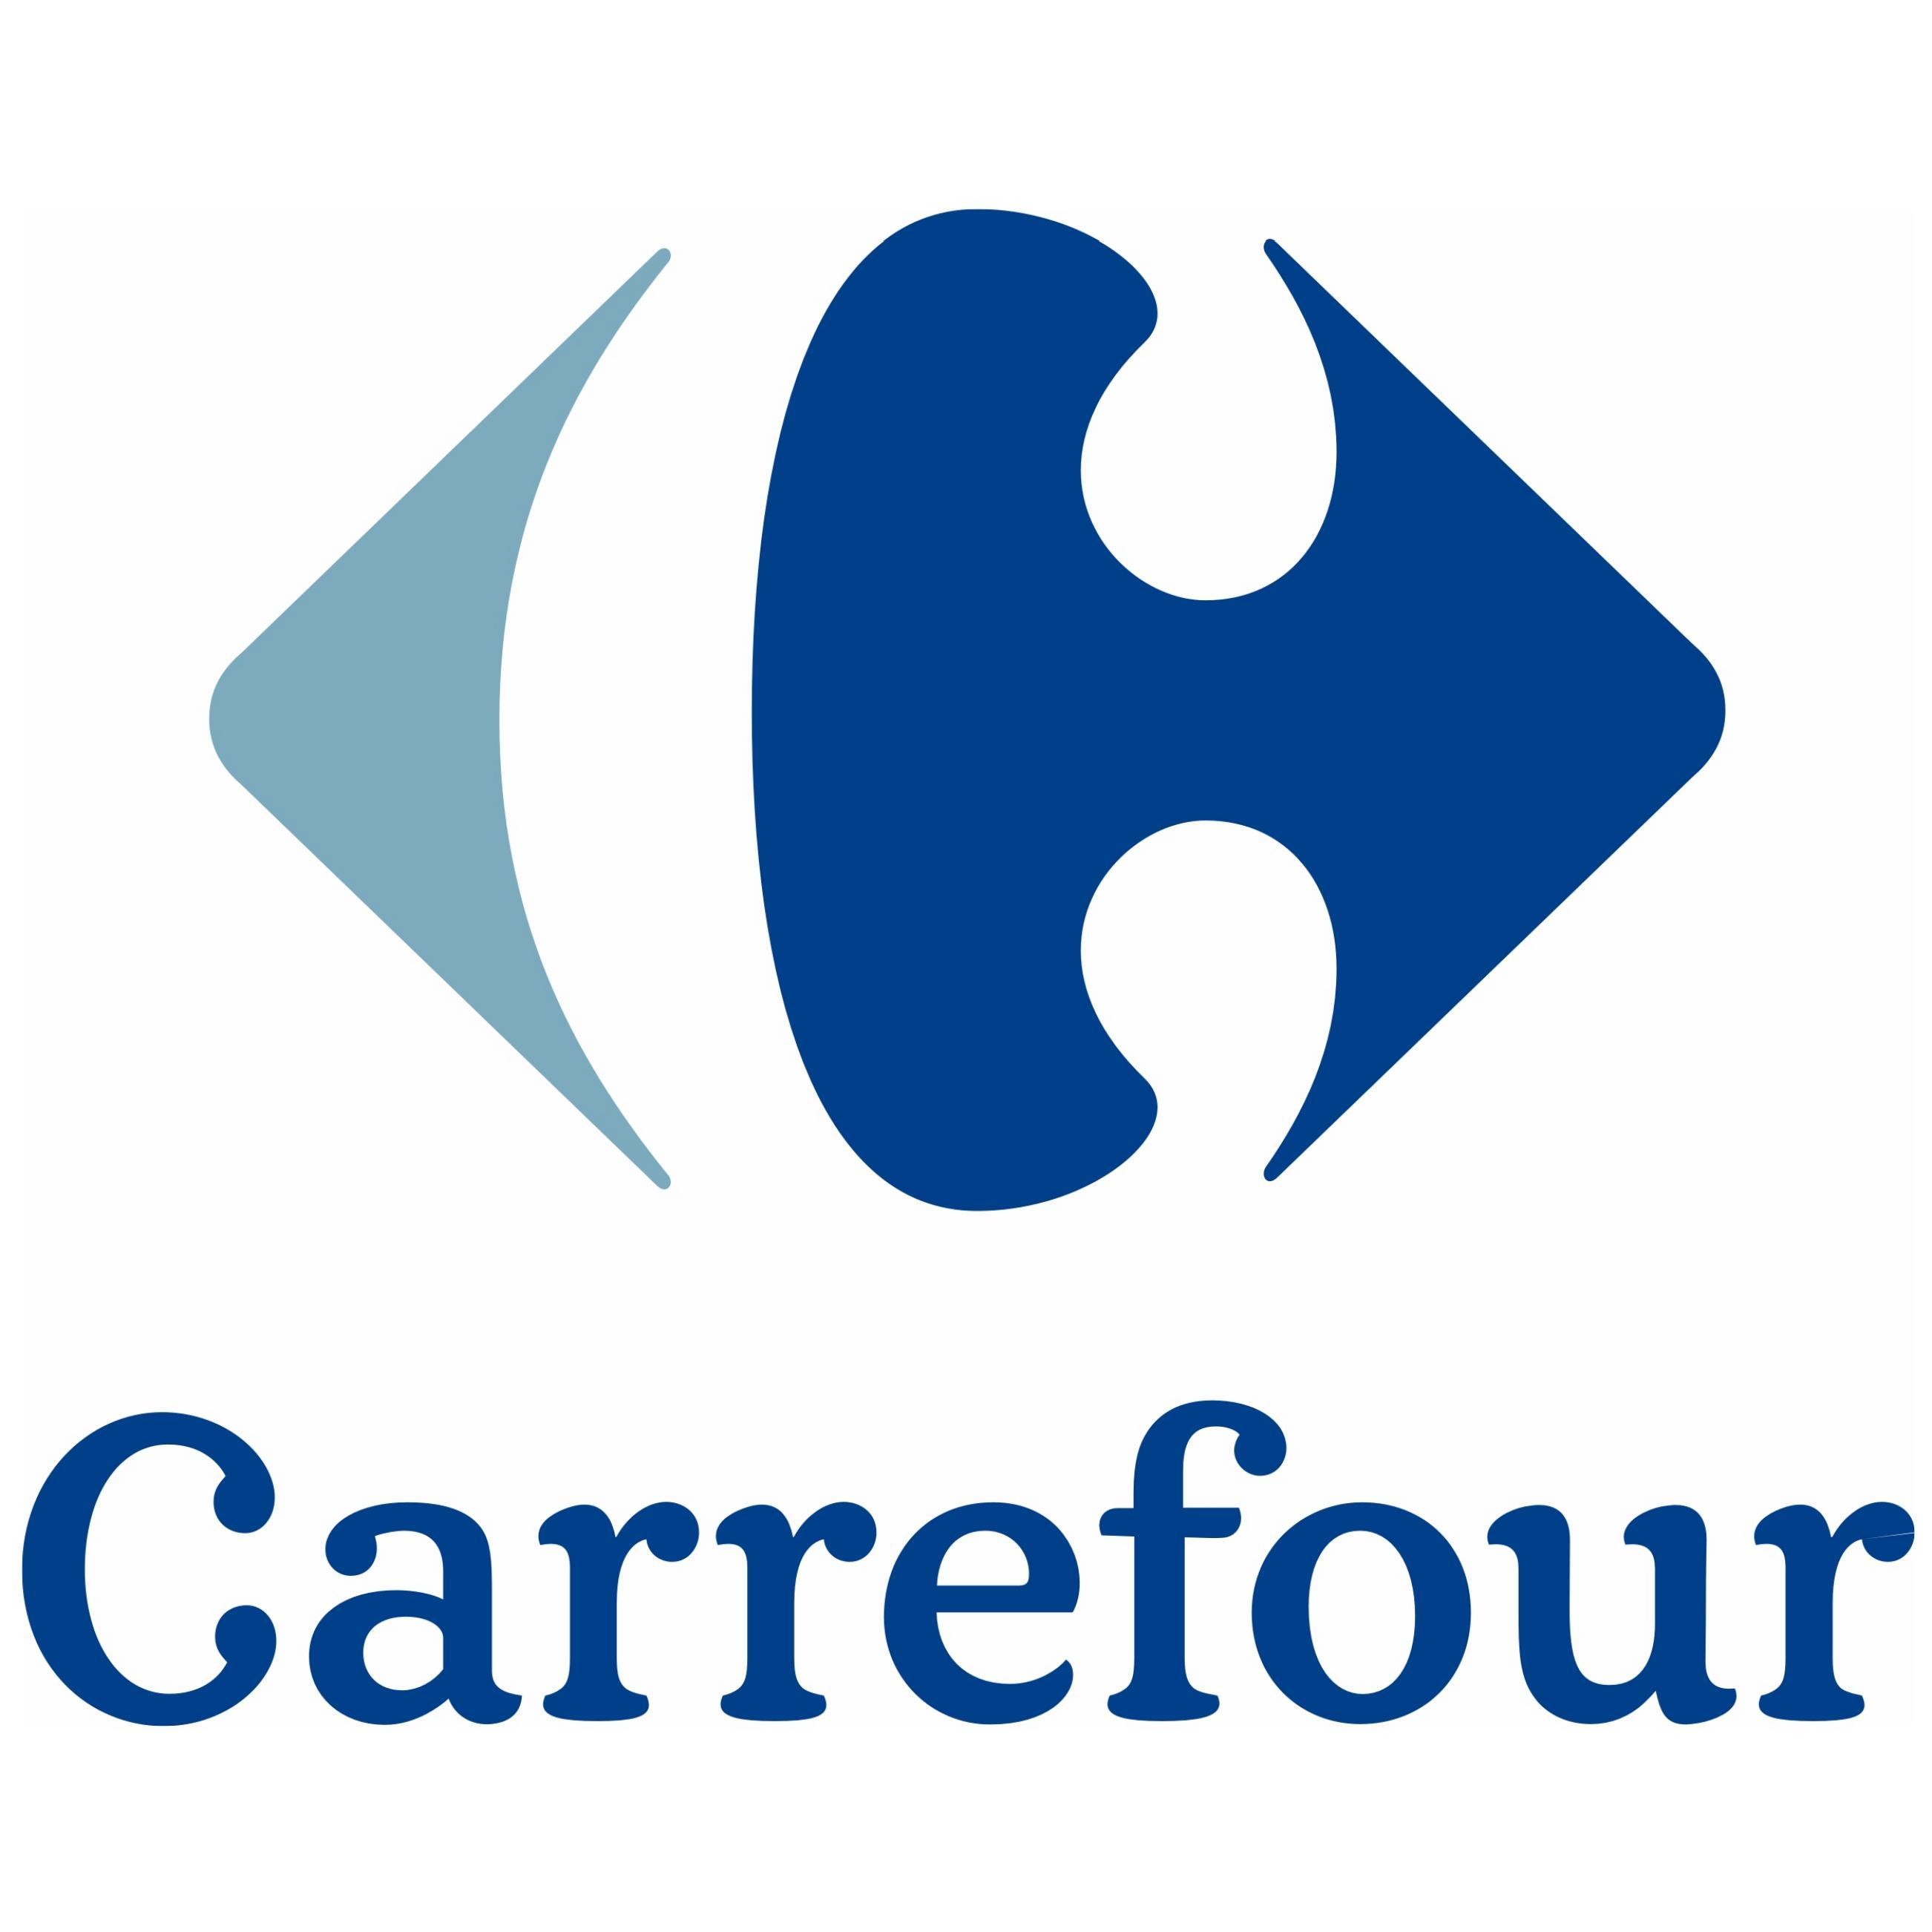 carrefour-groupe-logo.jpg